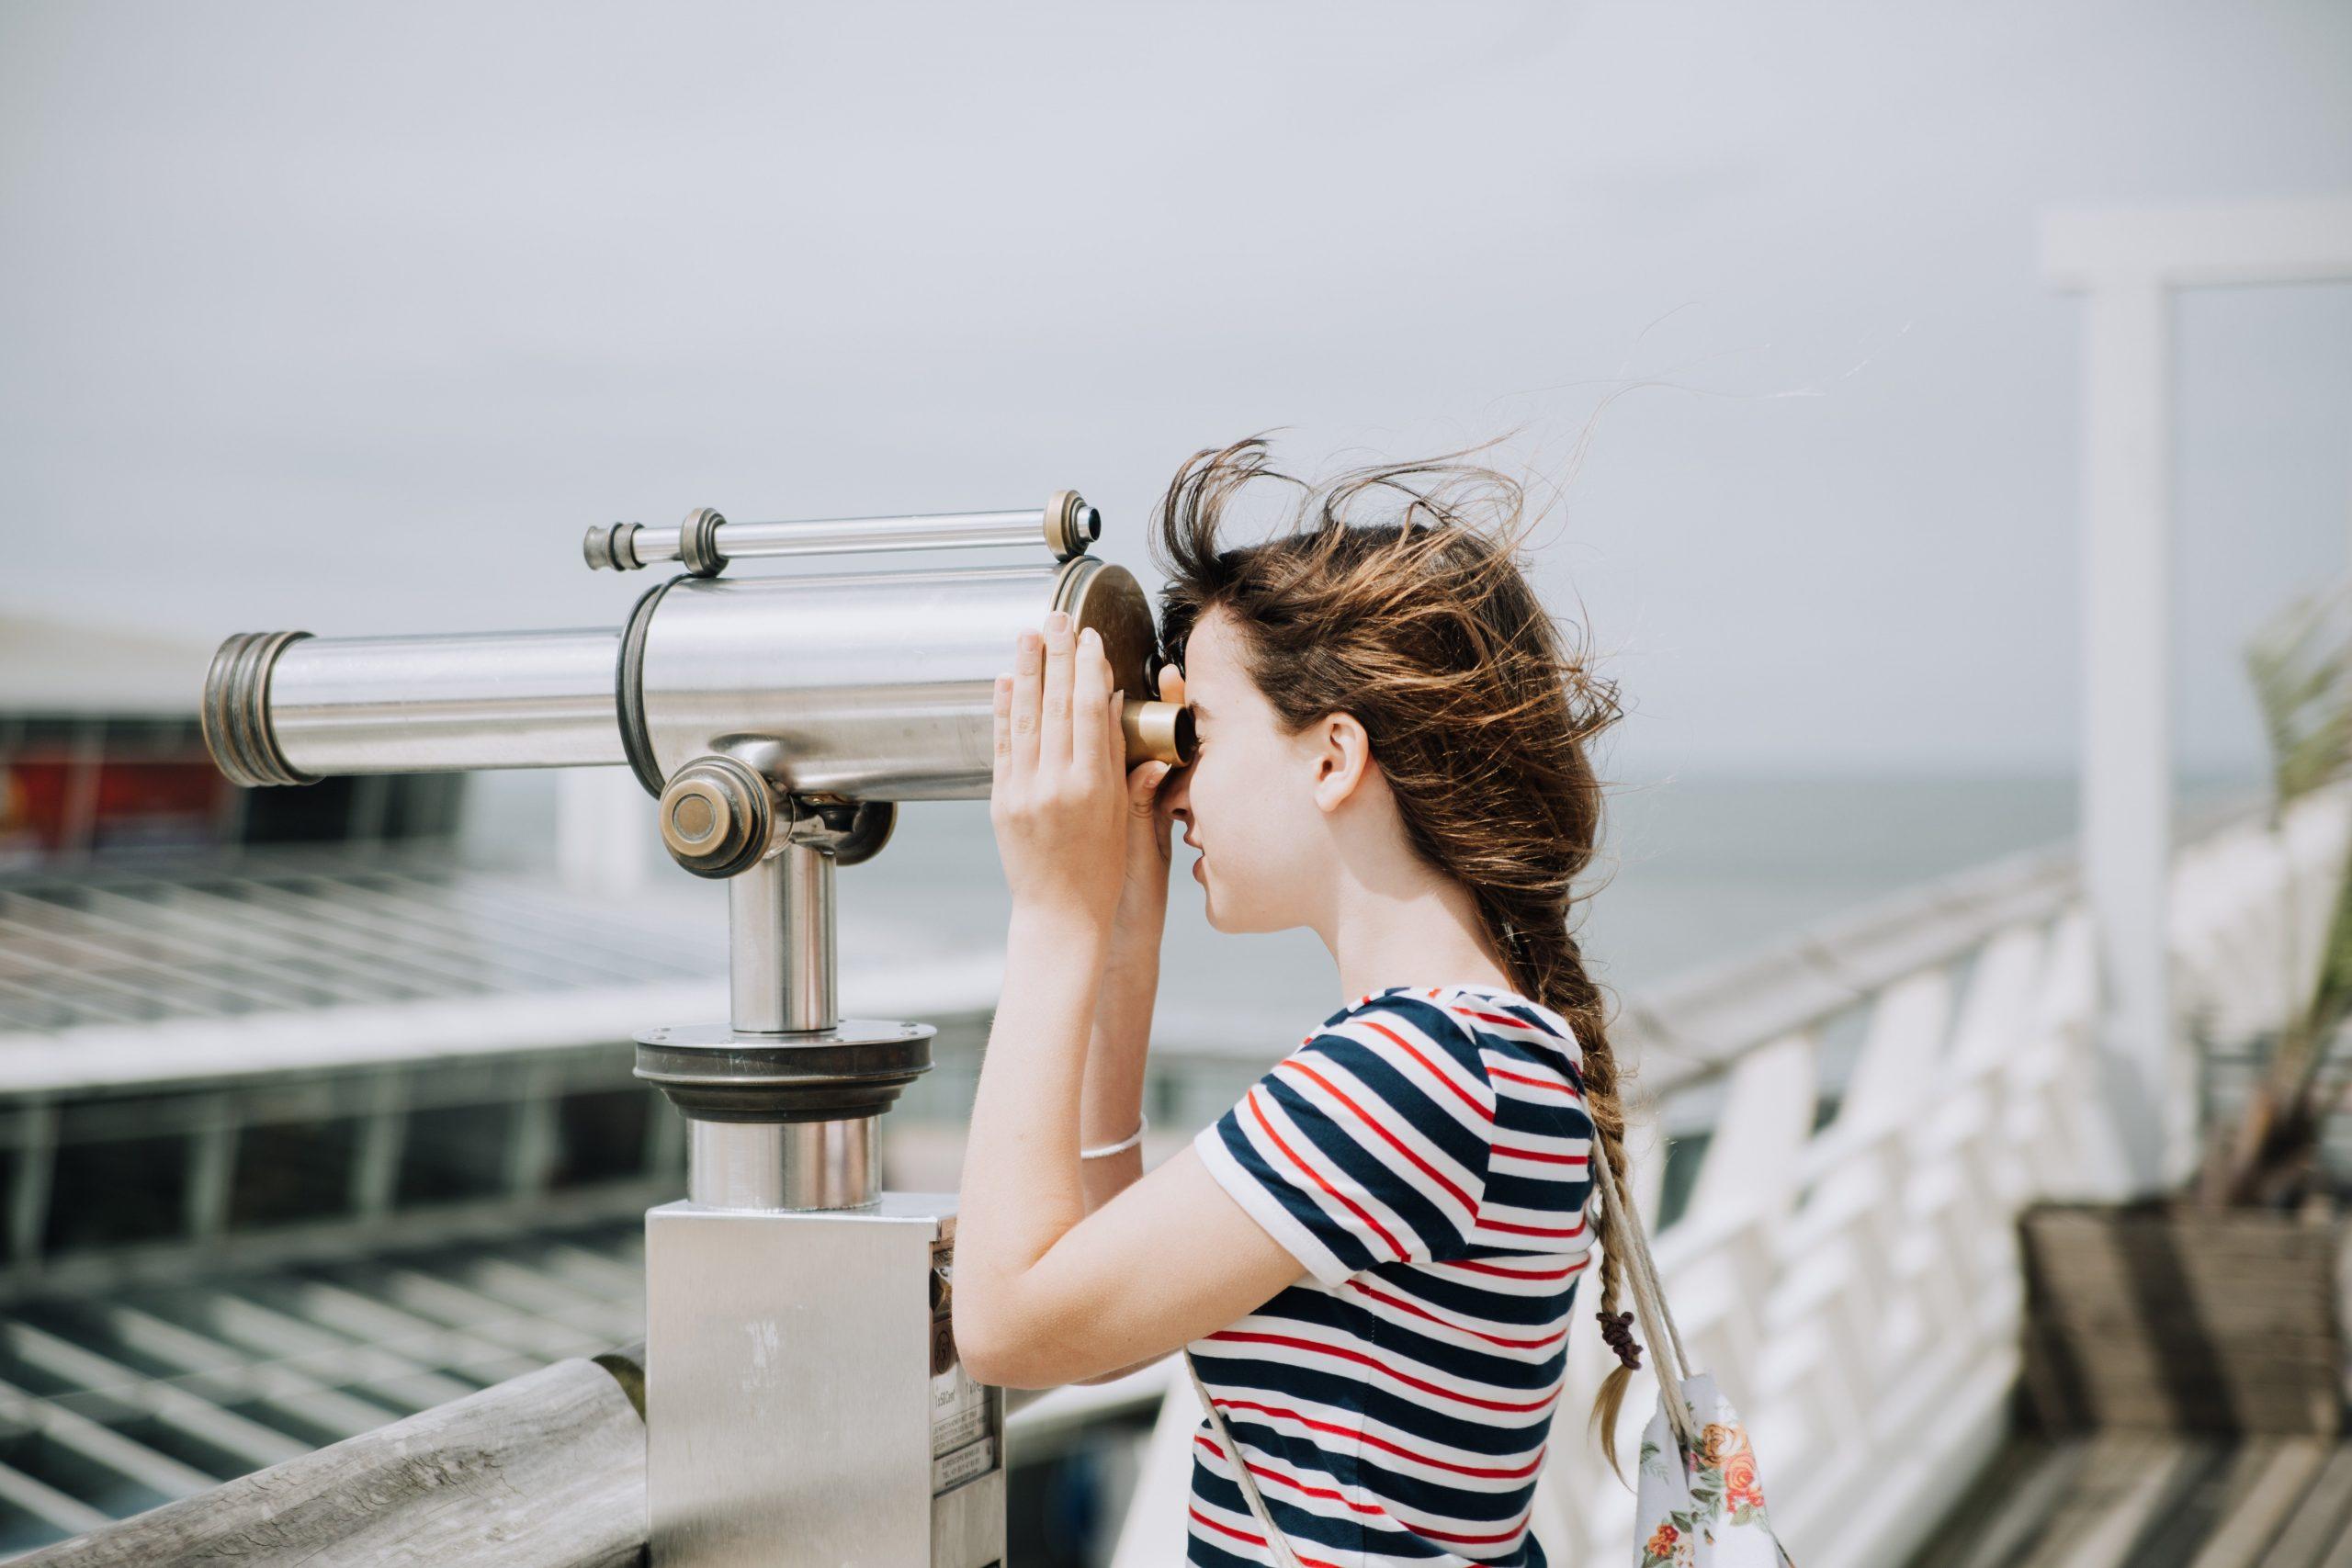 Vencer los miedos para atreverse a viajar sola 2